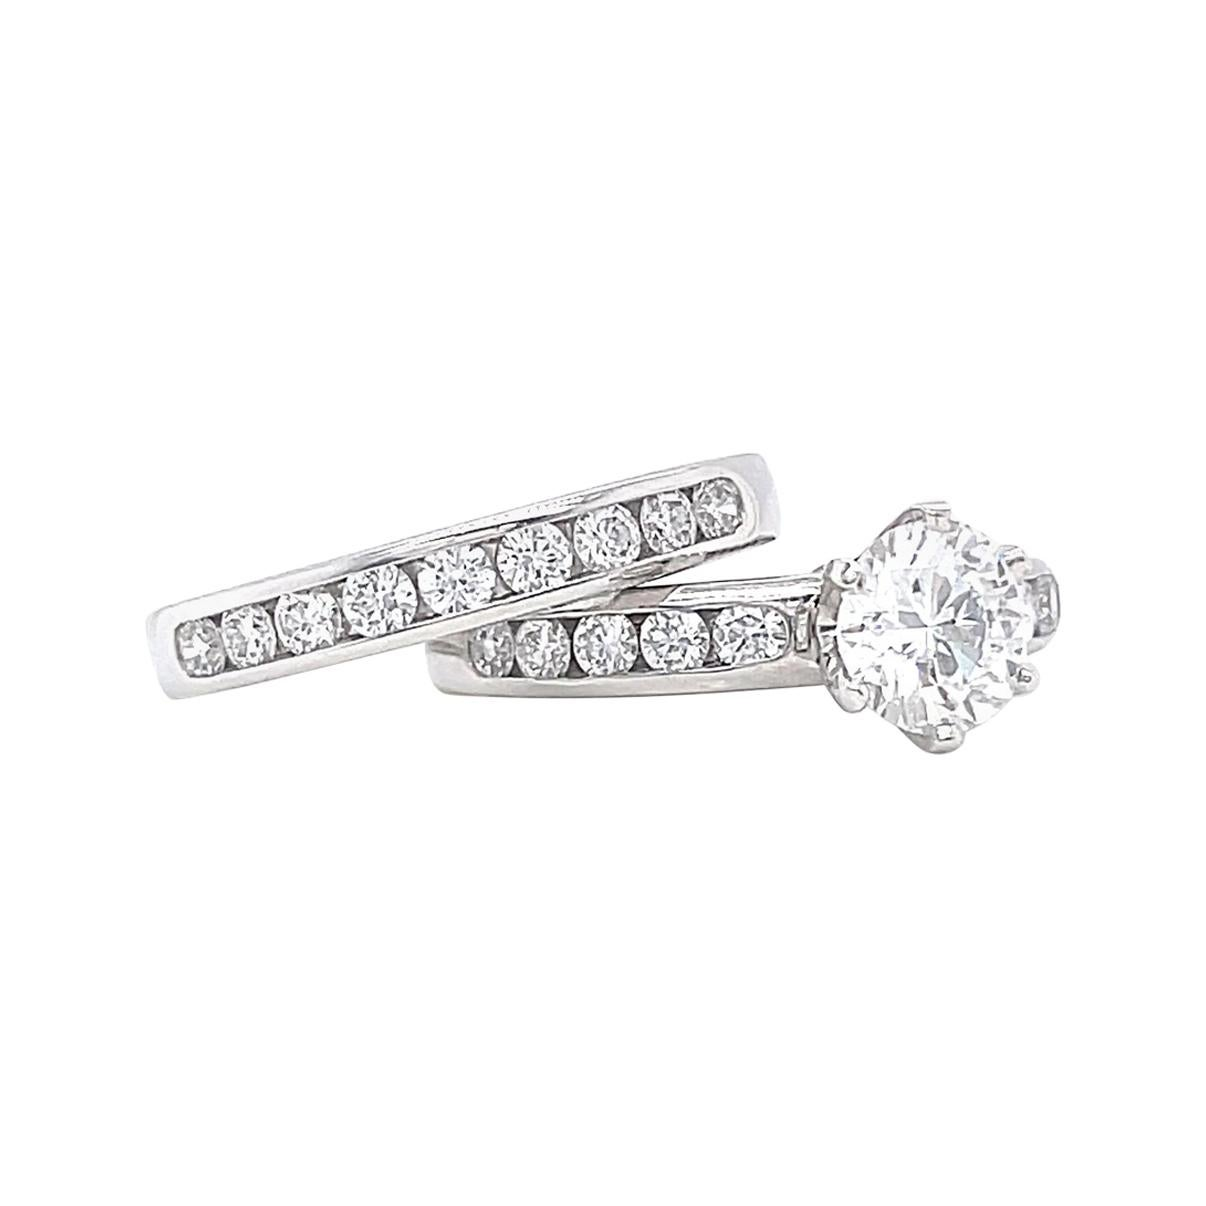 Vintage Tiffany & Co. Diamond Platinum Engagement Ring Set